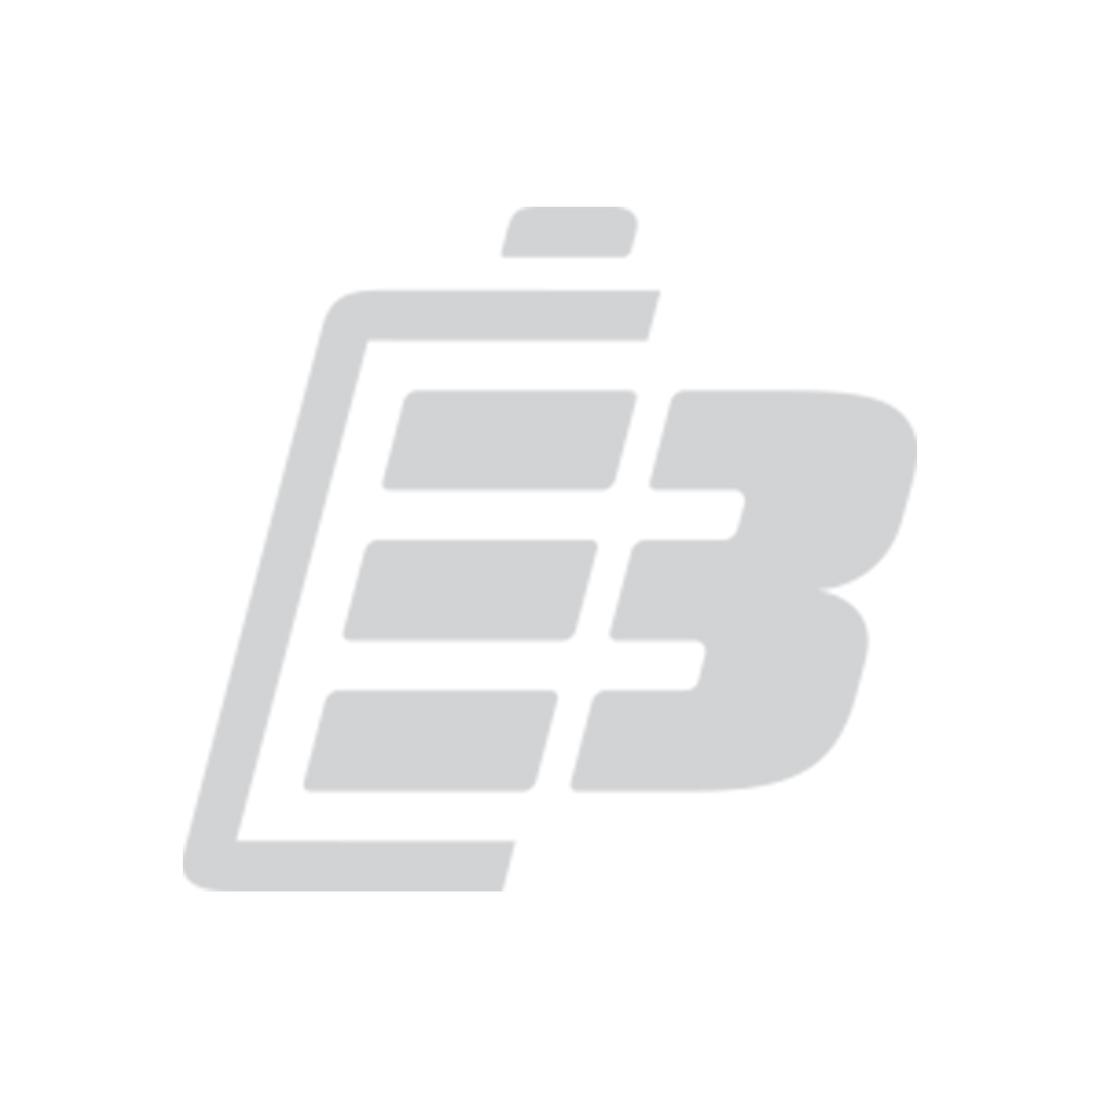 Smartphone battery Apple iPhone 7_1